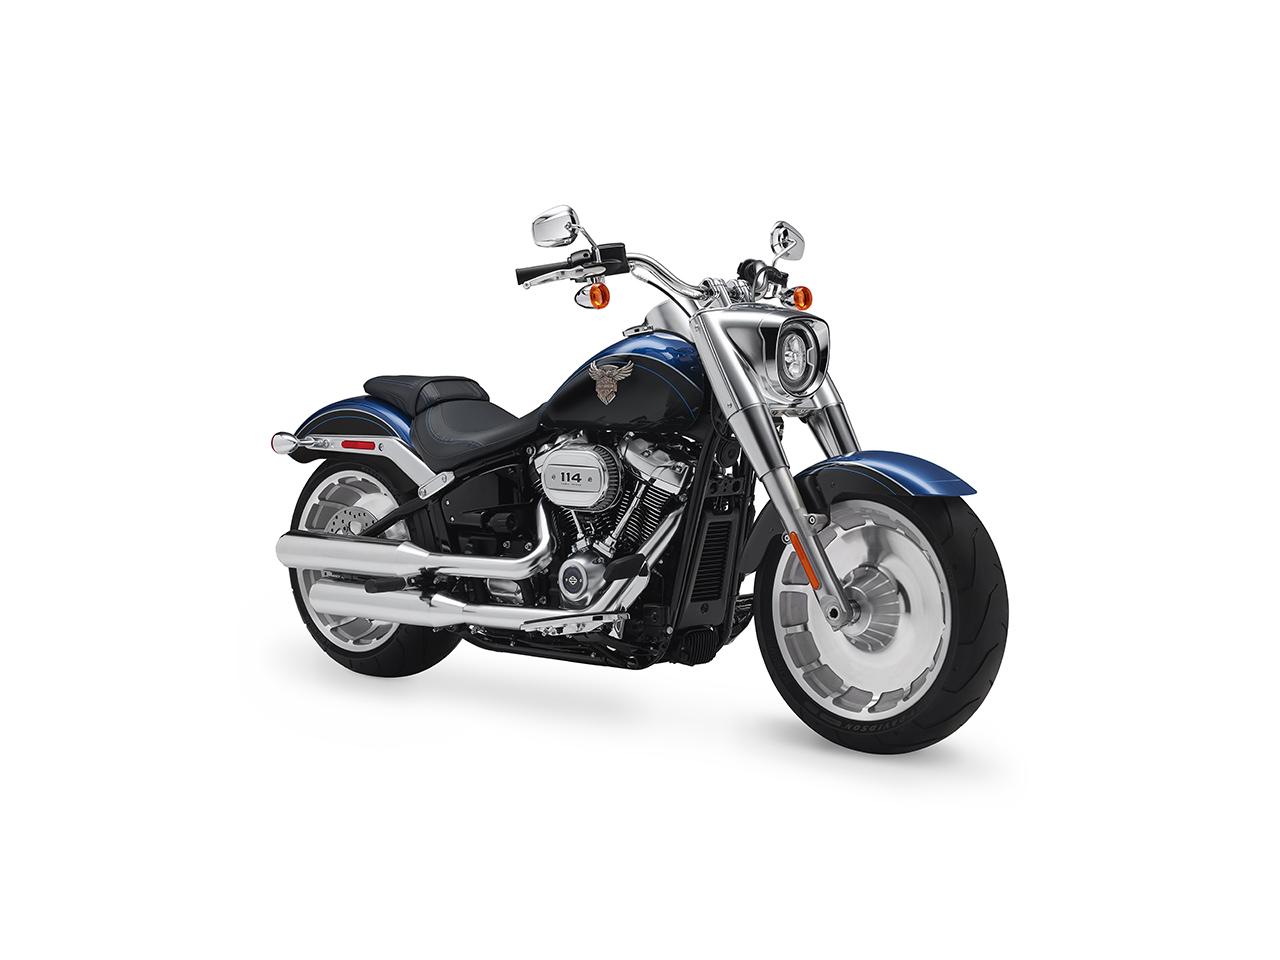 2018 Harley-Davidson Fat Boy 114 Image